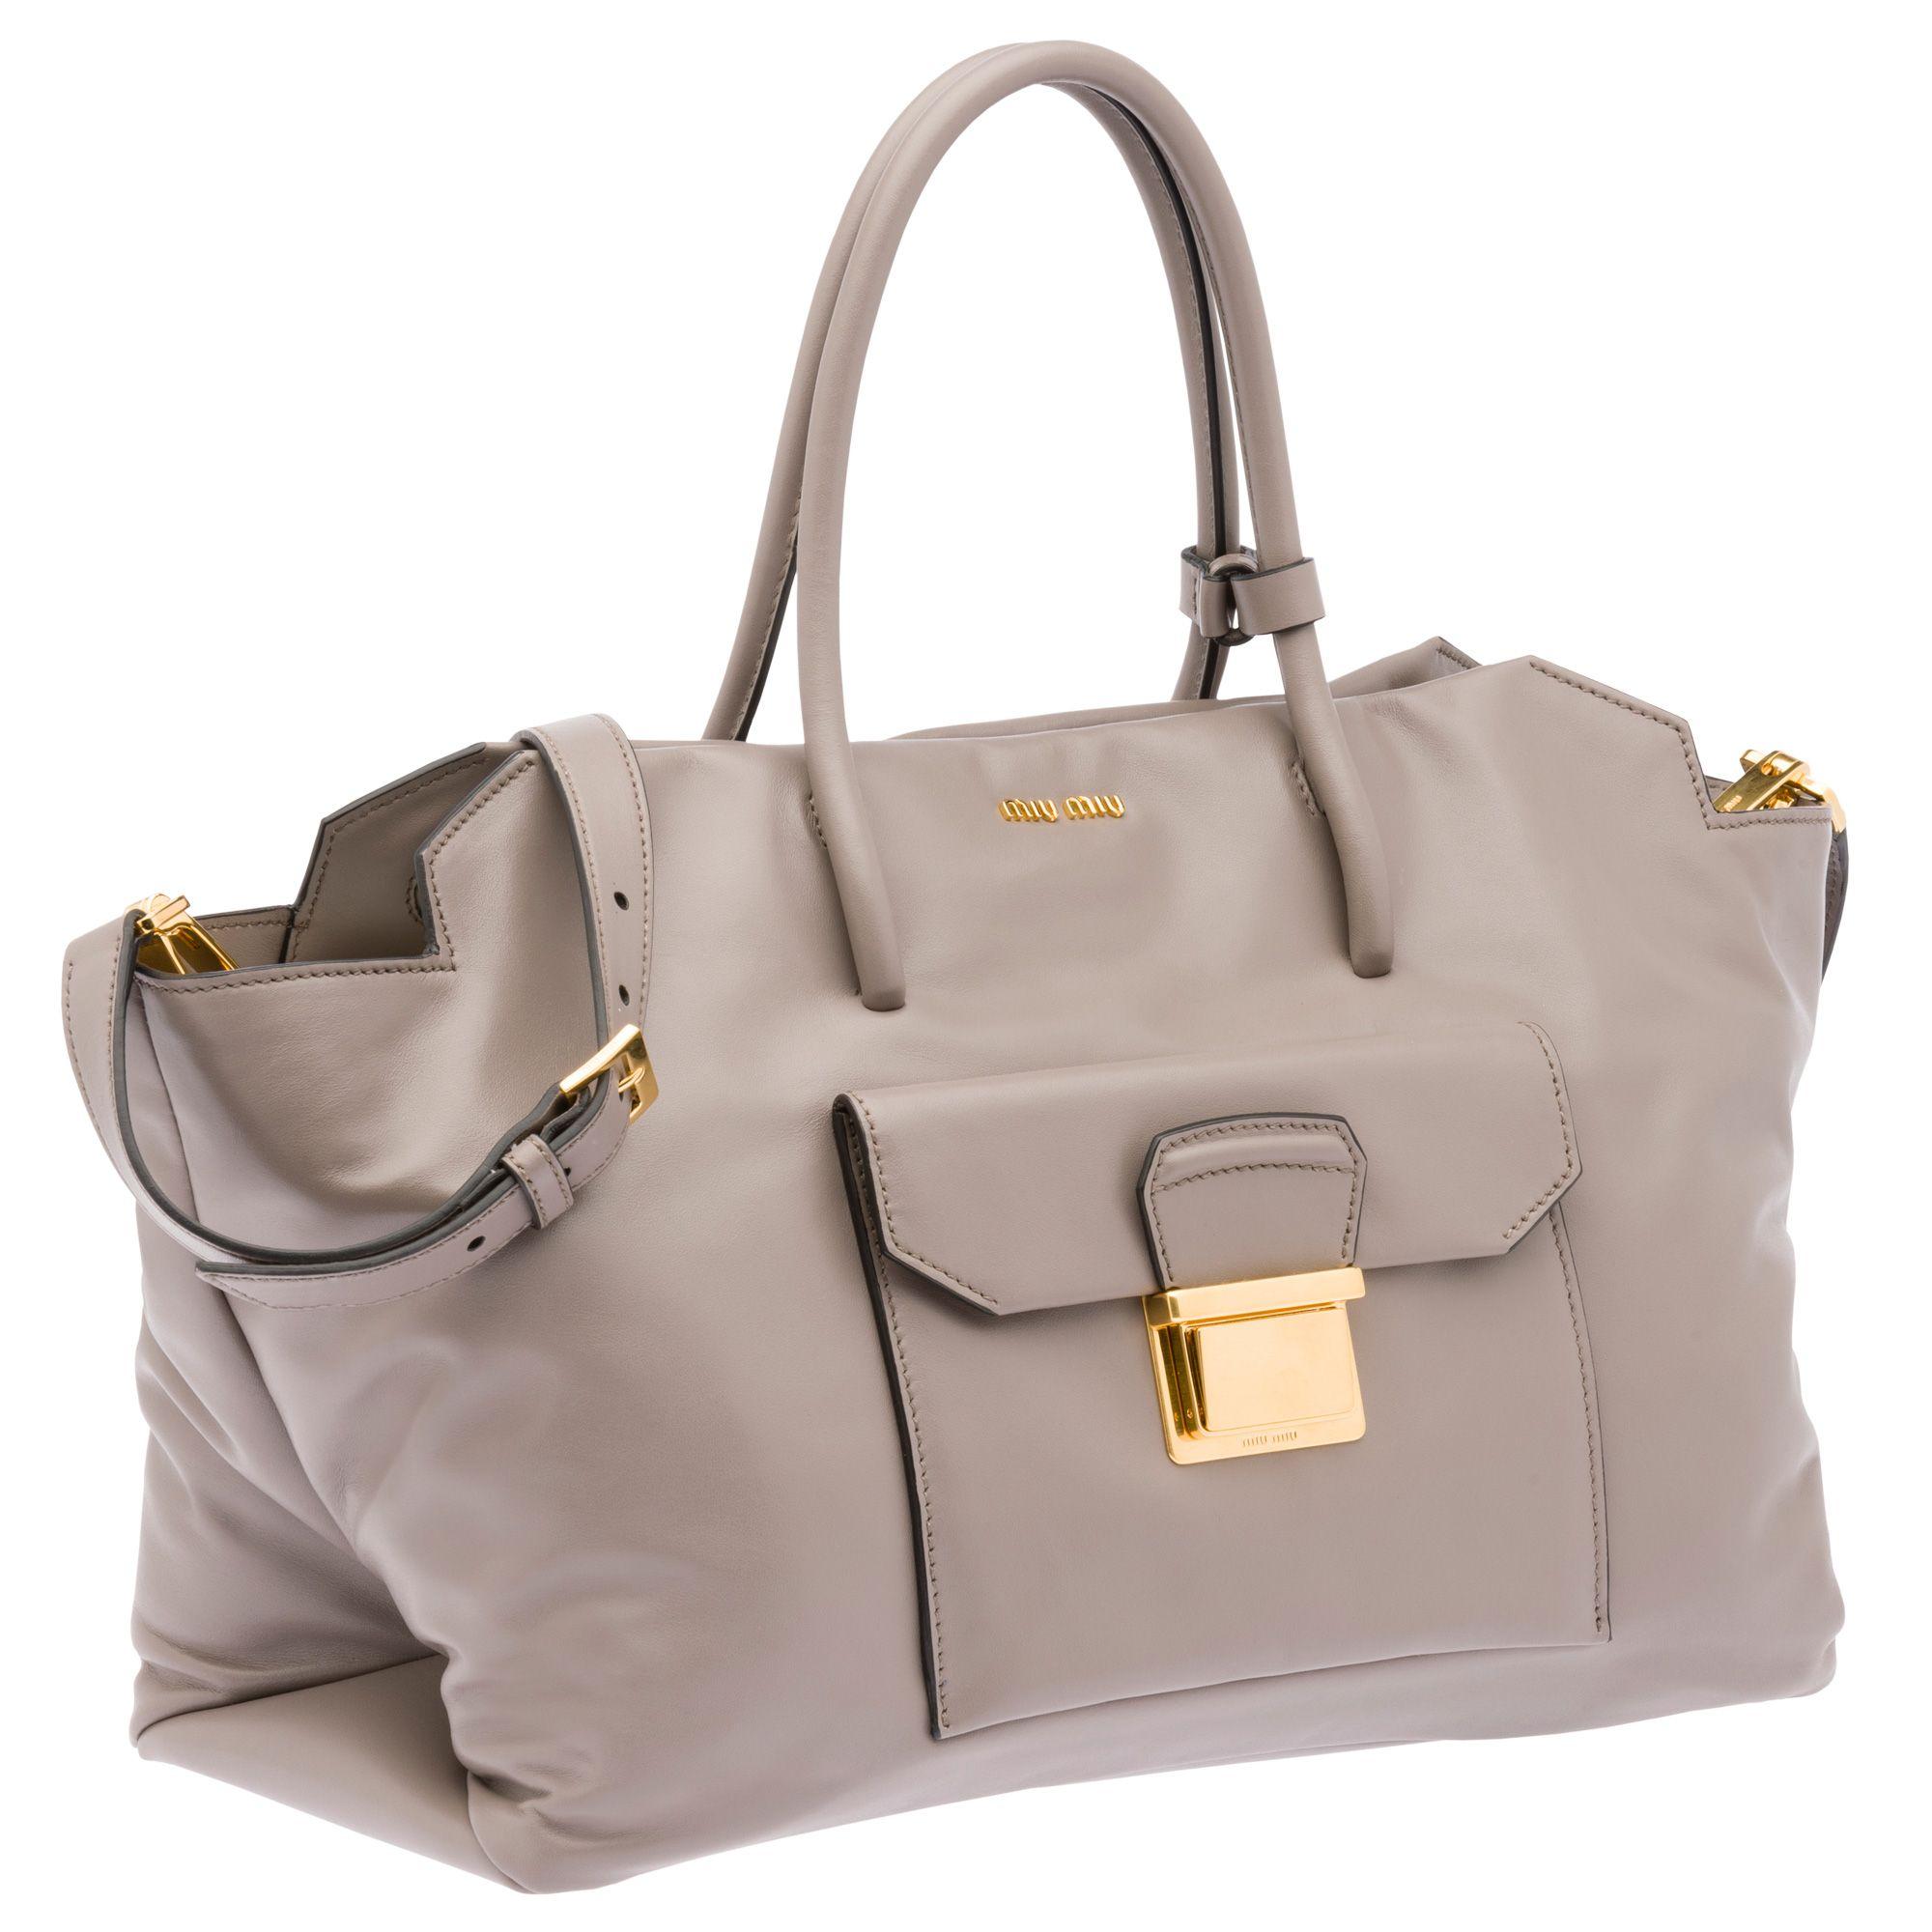 342a2aea00a Zoom-bootstrap   women bags   Pinterest   Miu miu, Handbags online ...